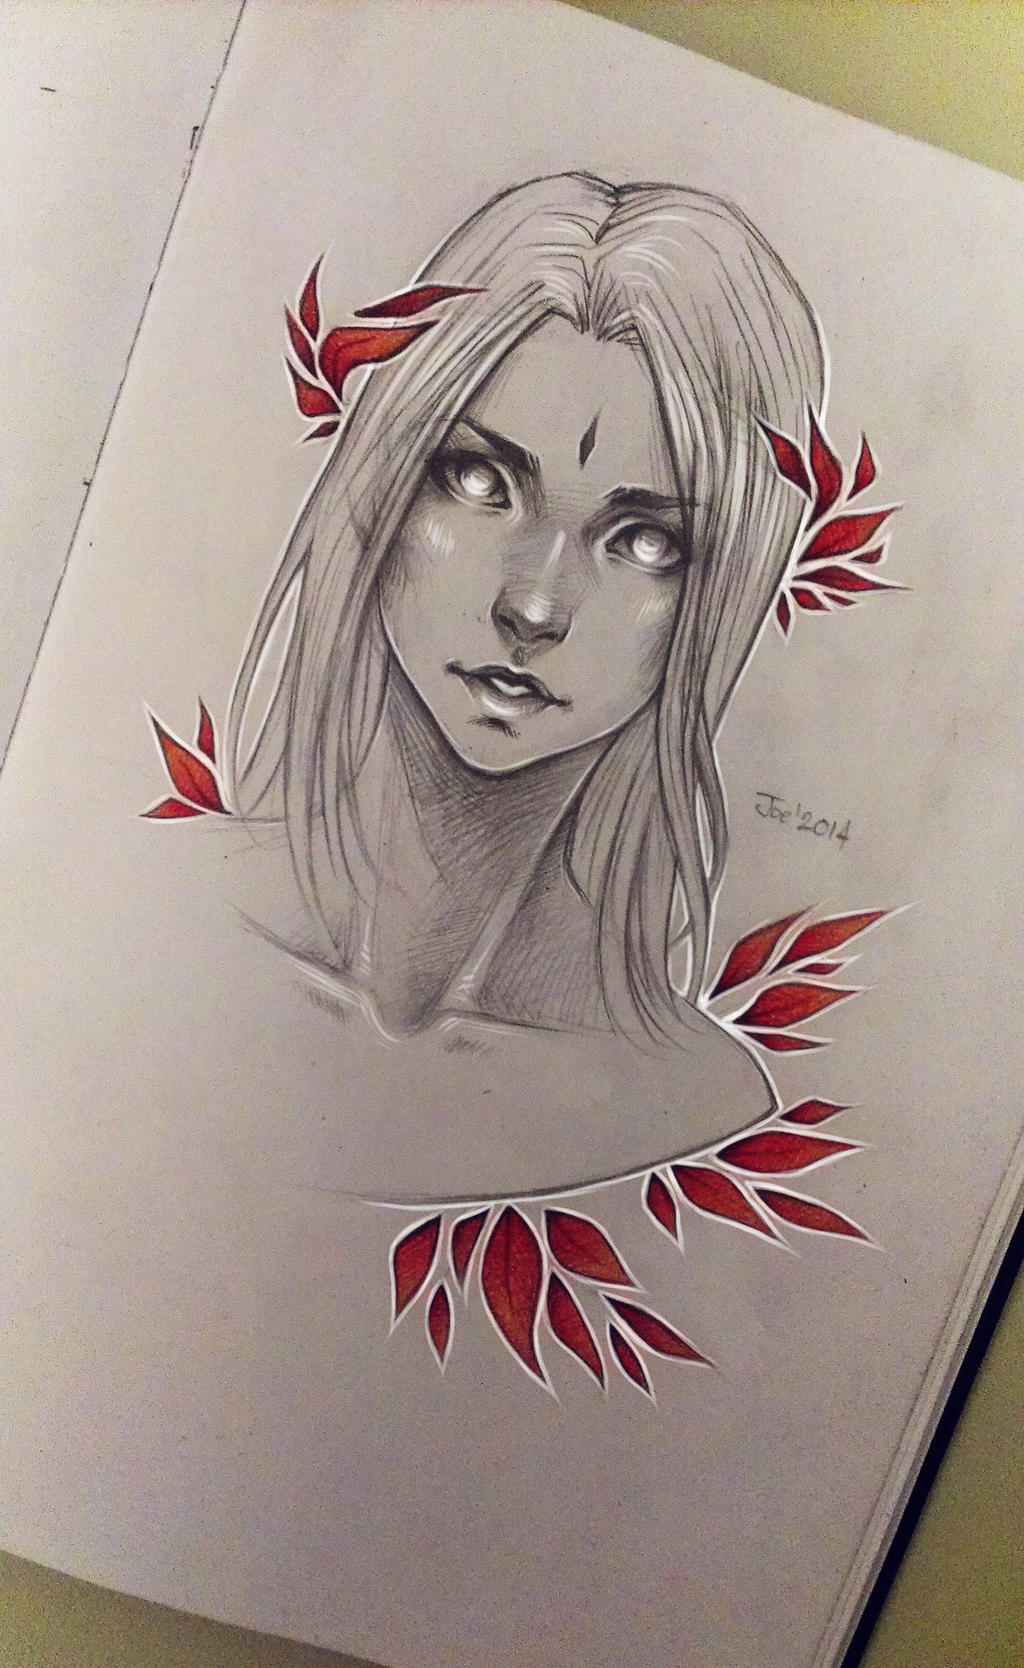 Red leaves [2] by sashajoe